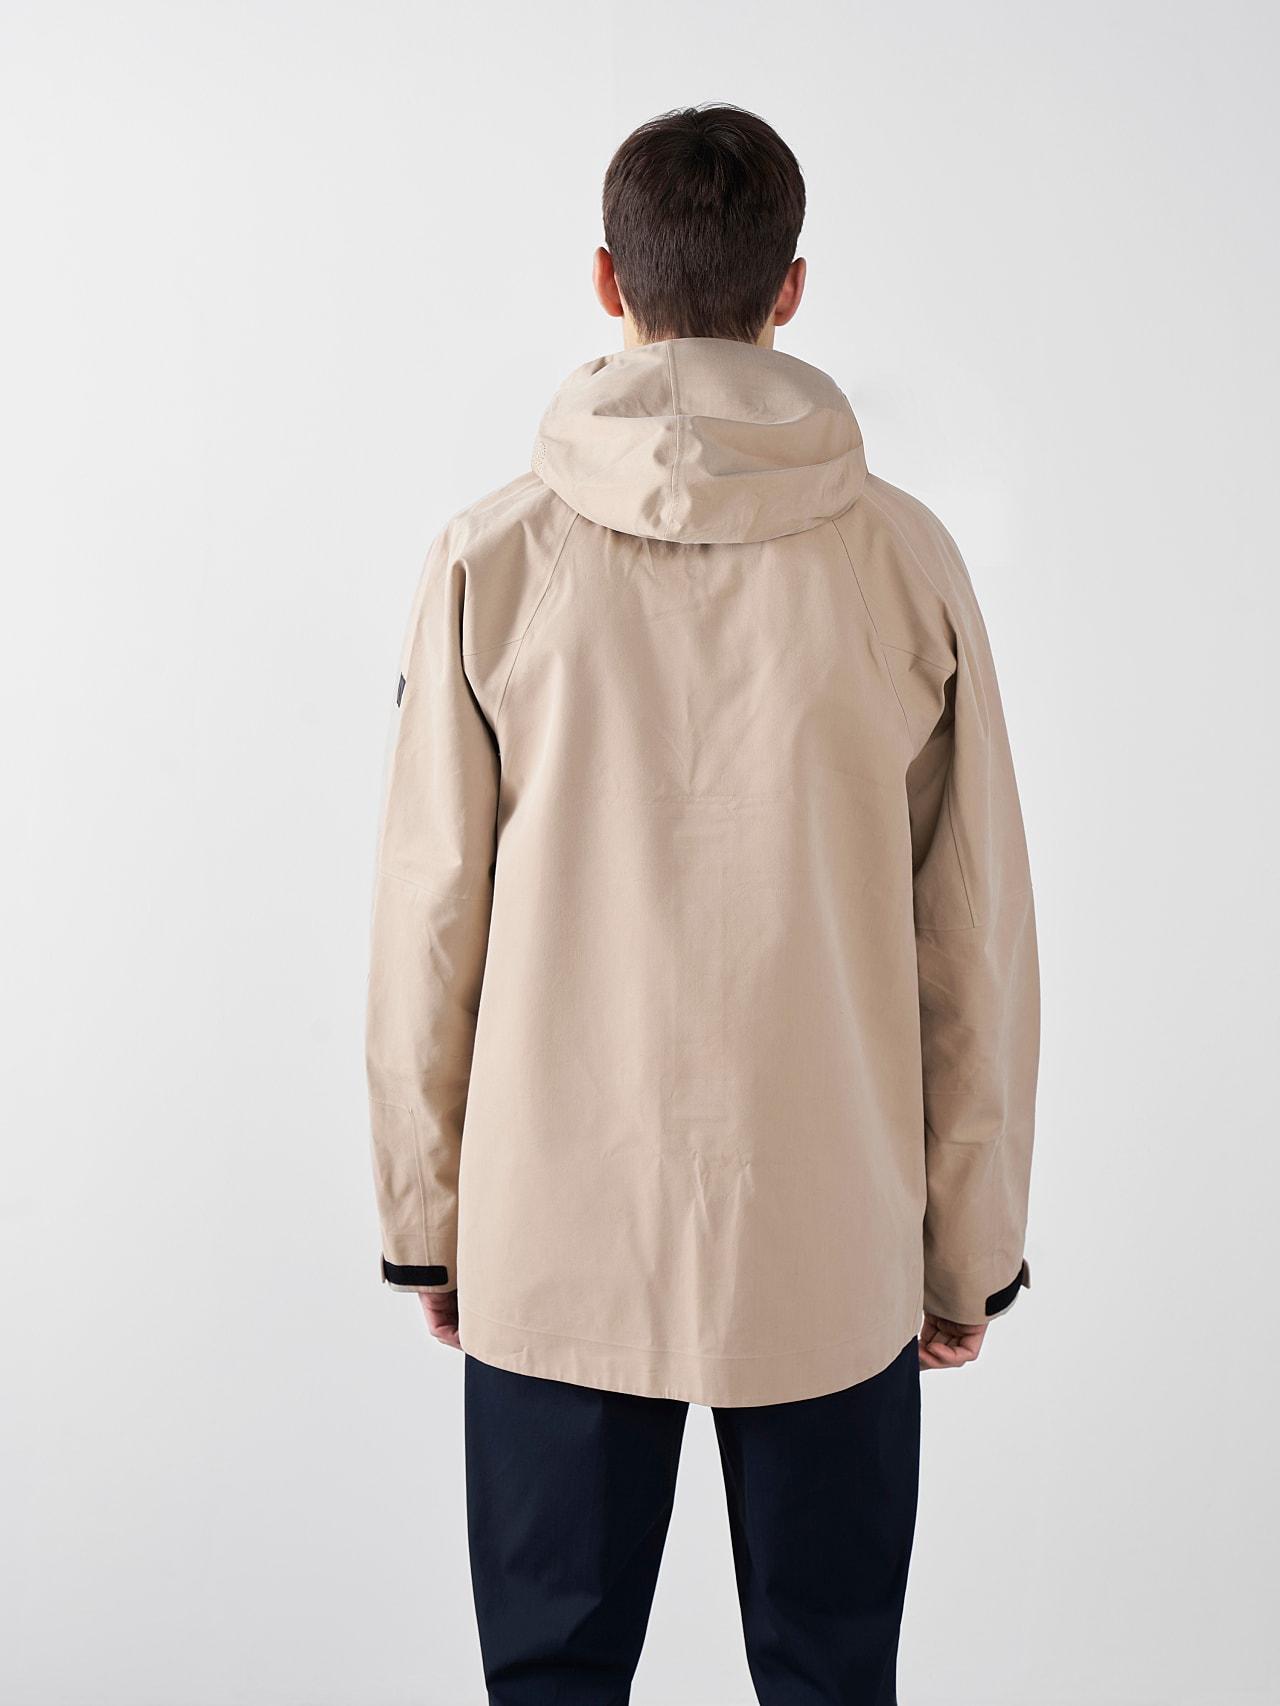 OKOVO V3.Y5.01 Packable Waterproof Jacket Sand Front Main Alpha Tauri